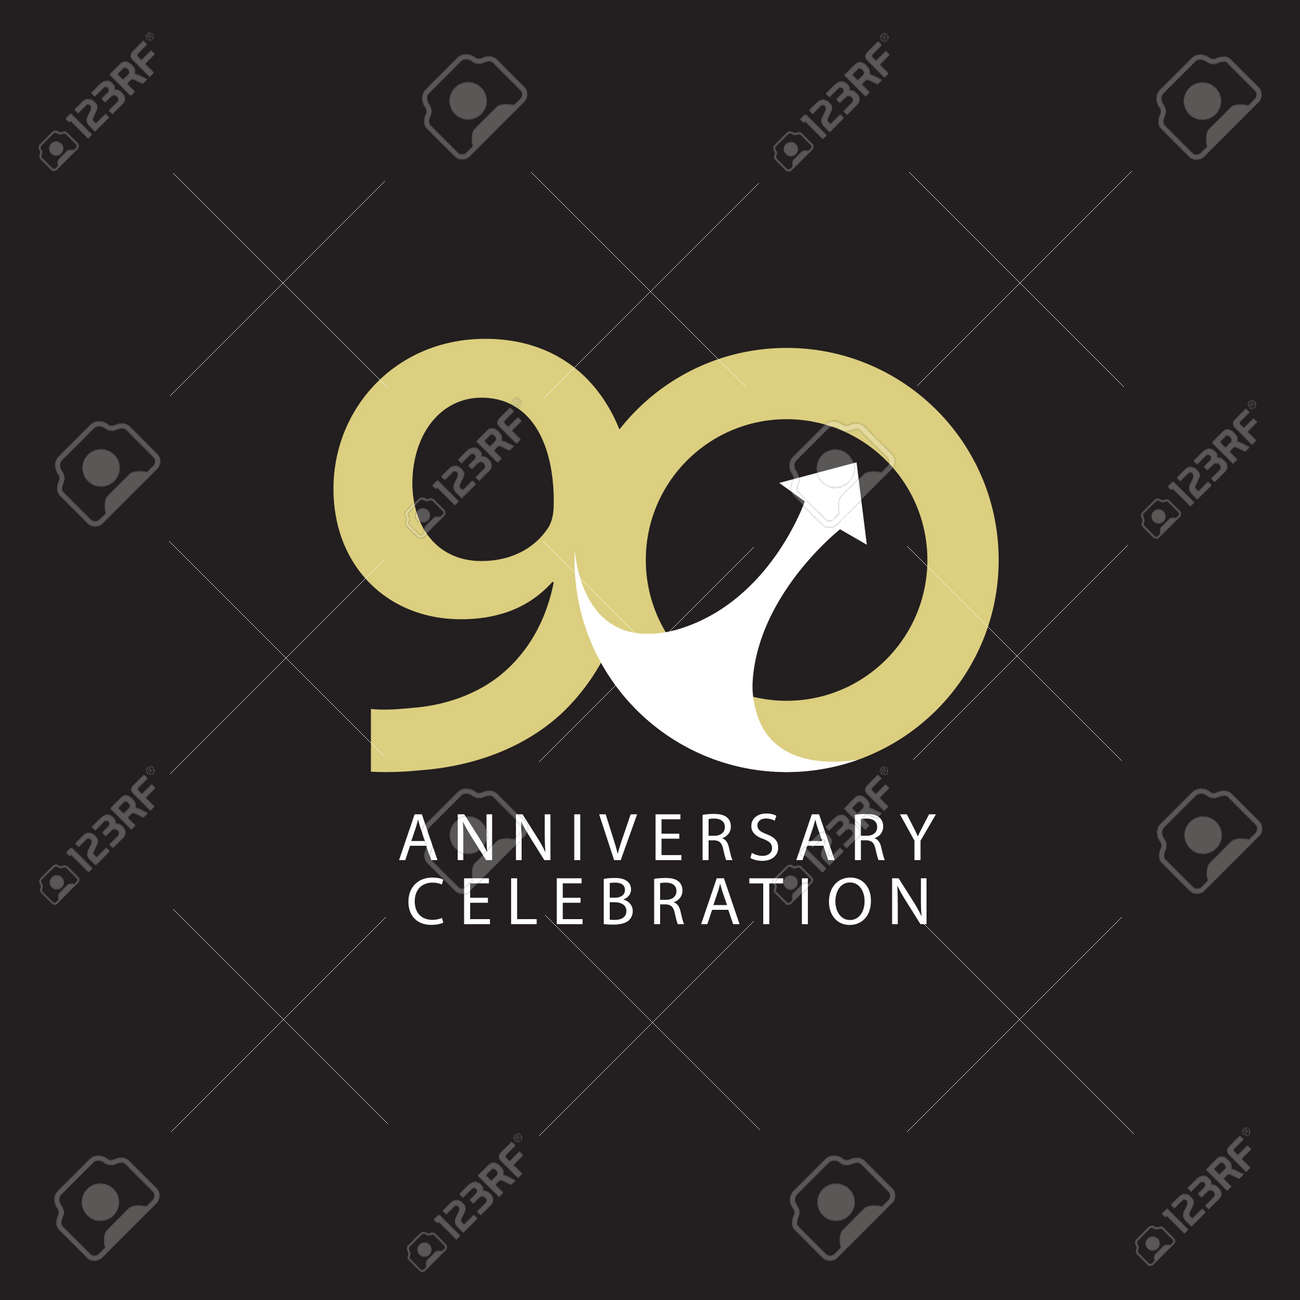 90 Years Anniversary Celebration Vector Template Design Illustration - 163698078